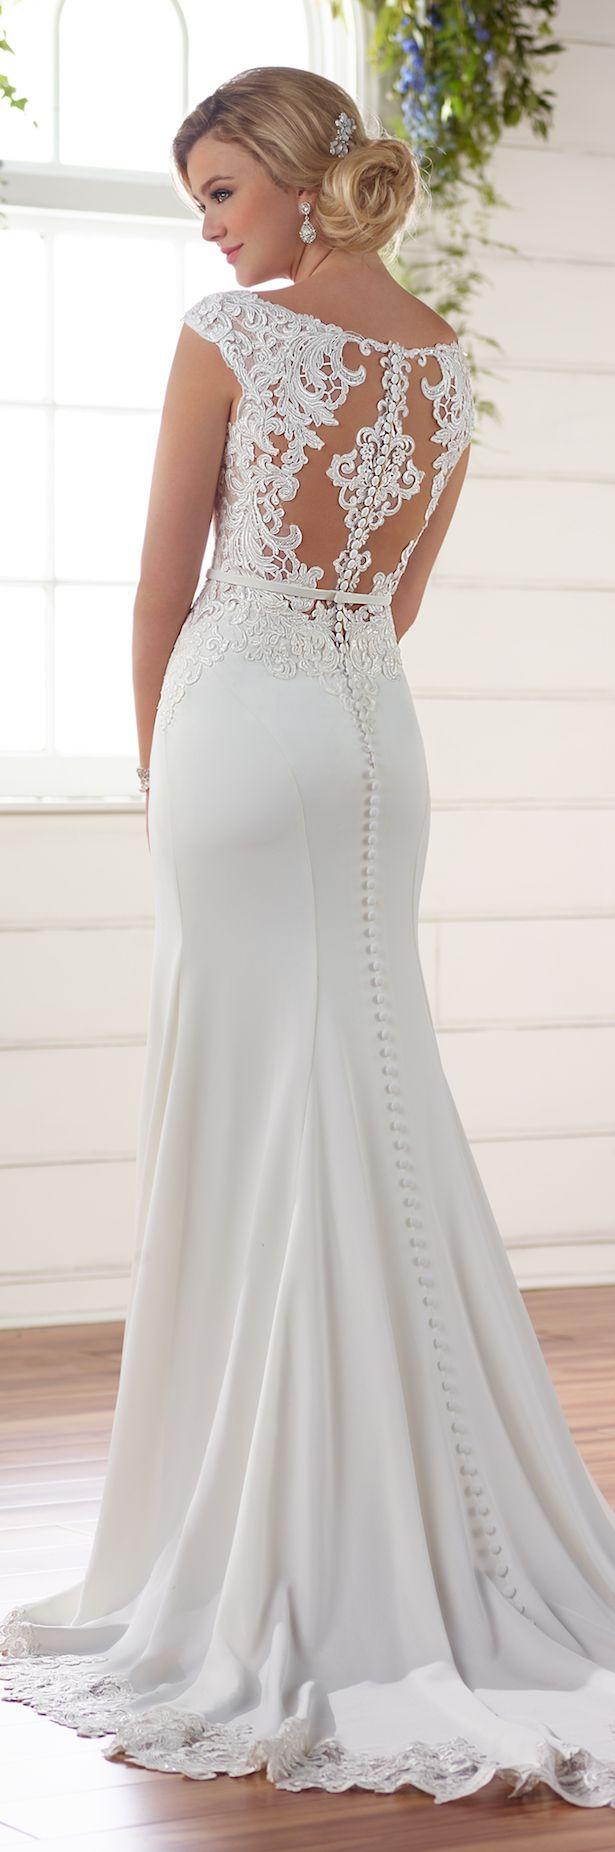 wedding dresses australia wedding dressing Essense of Australia Spring Bridal Collection